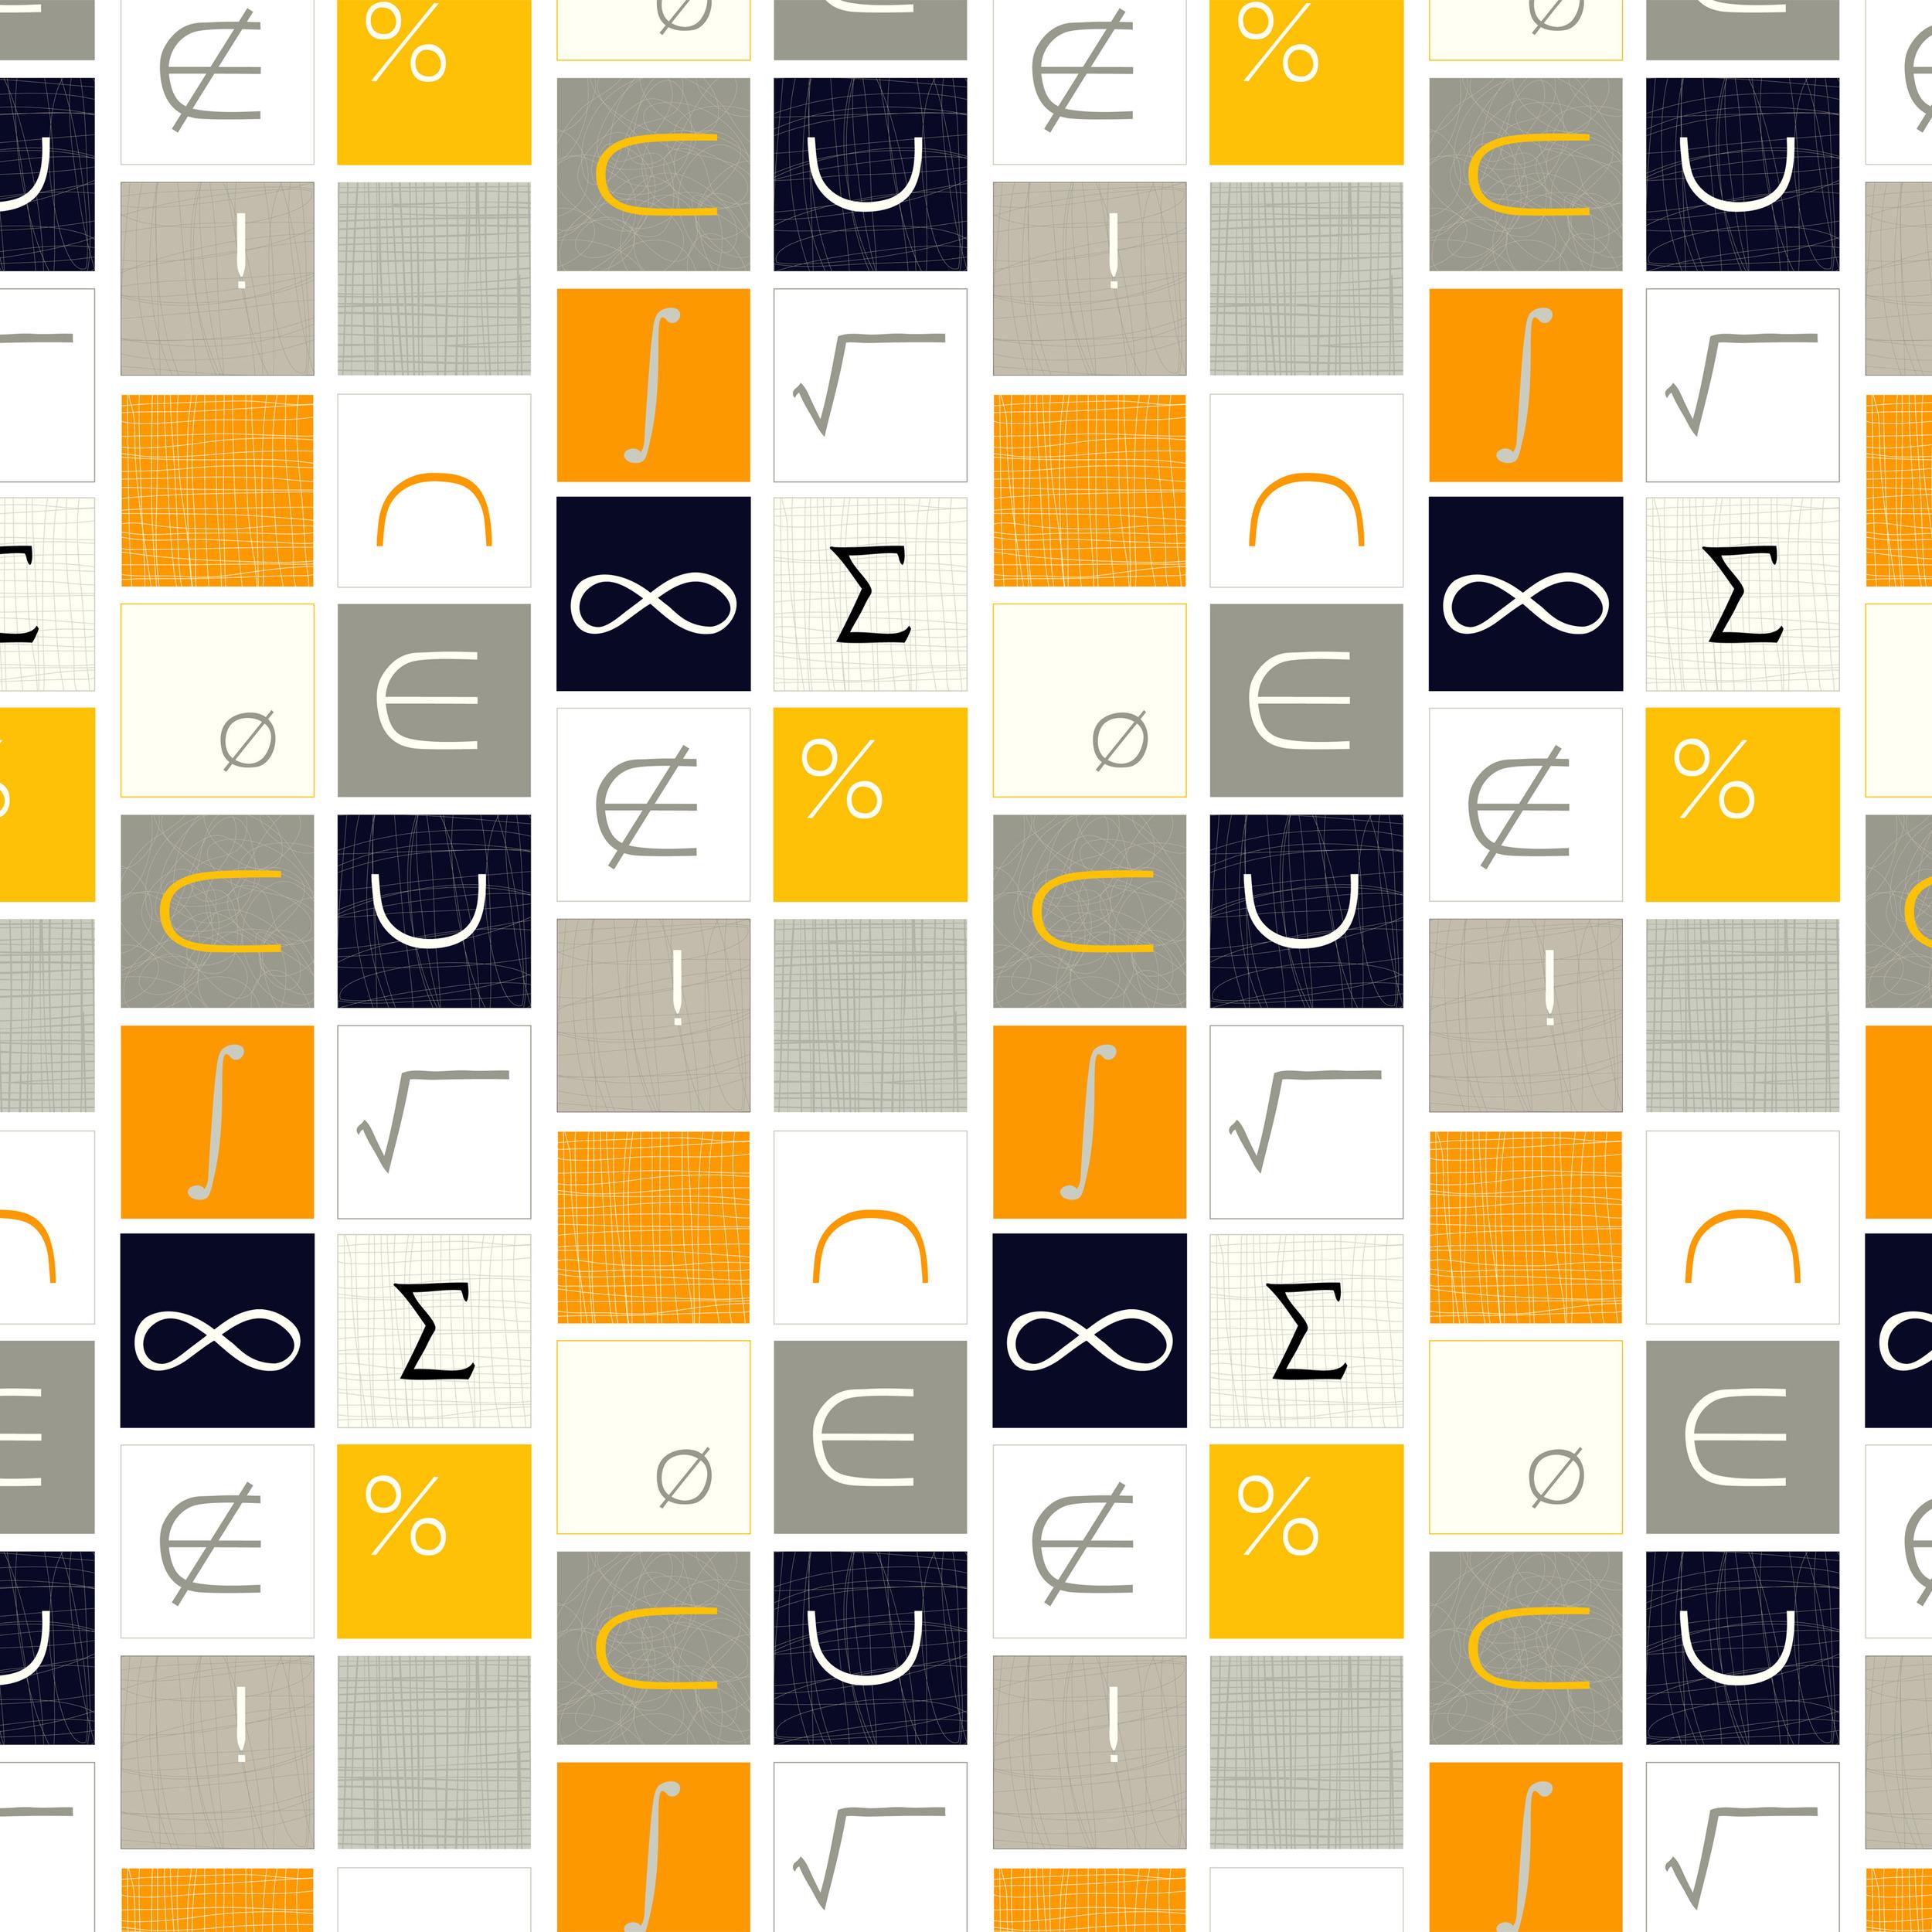 math geek chic by laurie baars